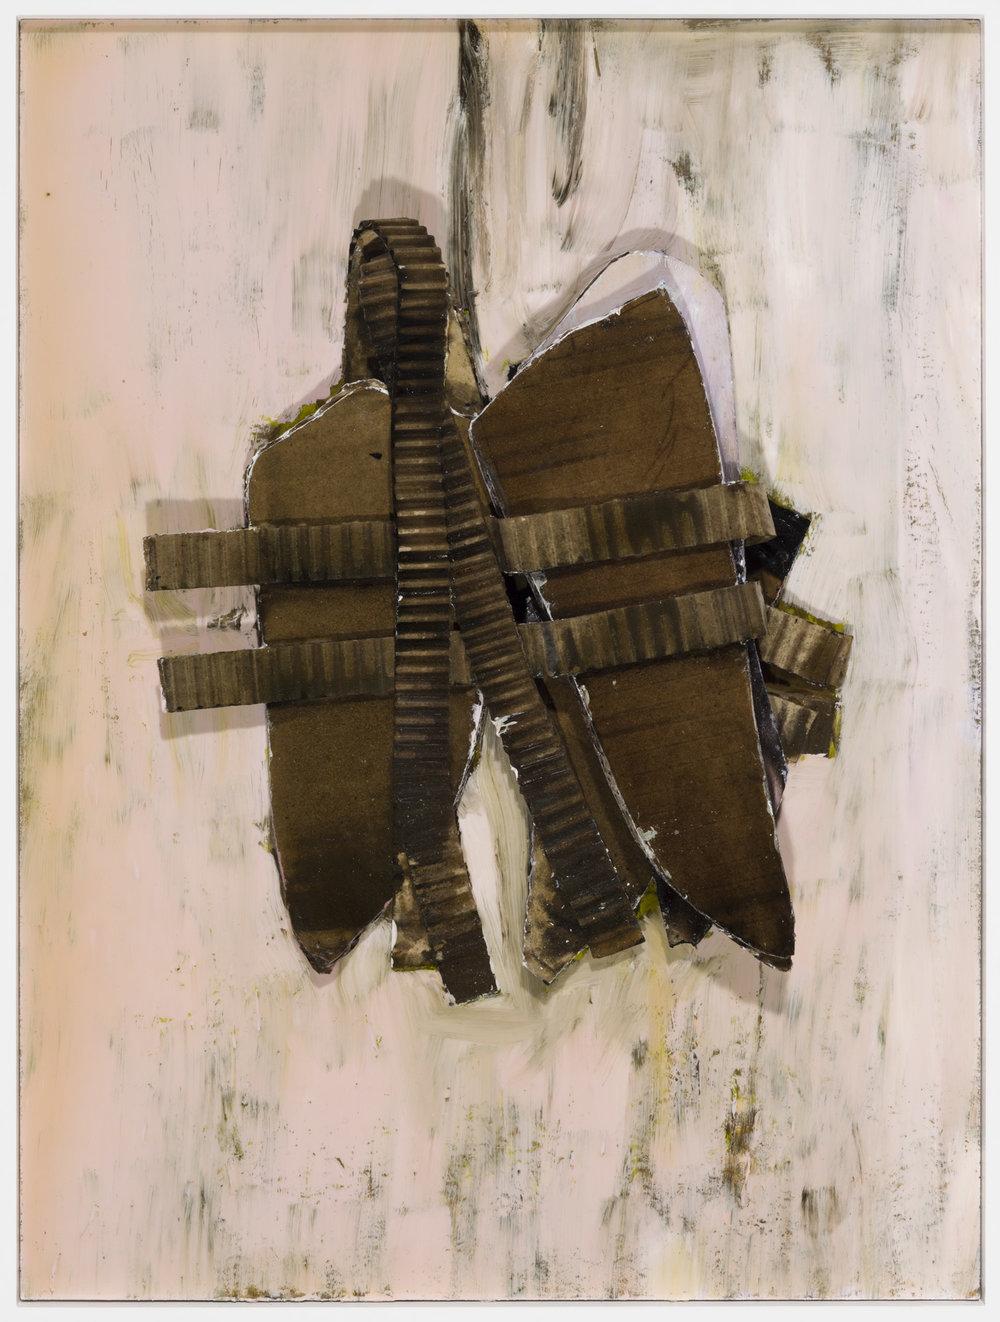 Schweres Gepäck , 2014  acrylic, oil, lacquer, cardboard on cardboard  49,4 × 37,3 × 6 cm